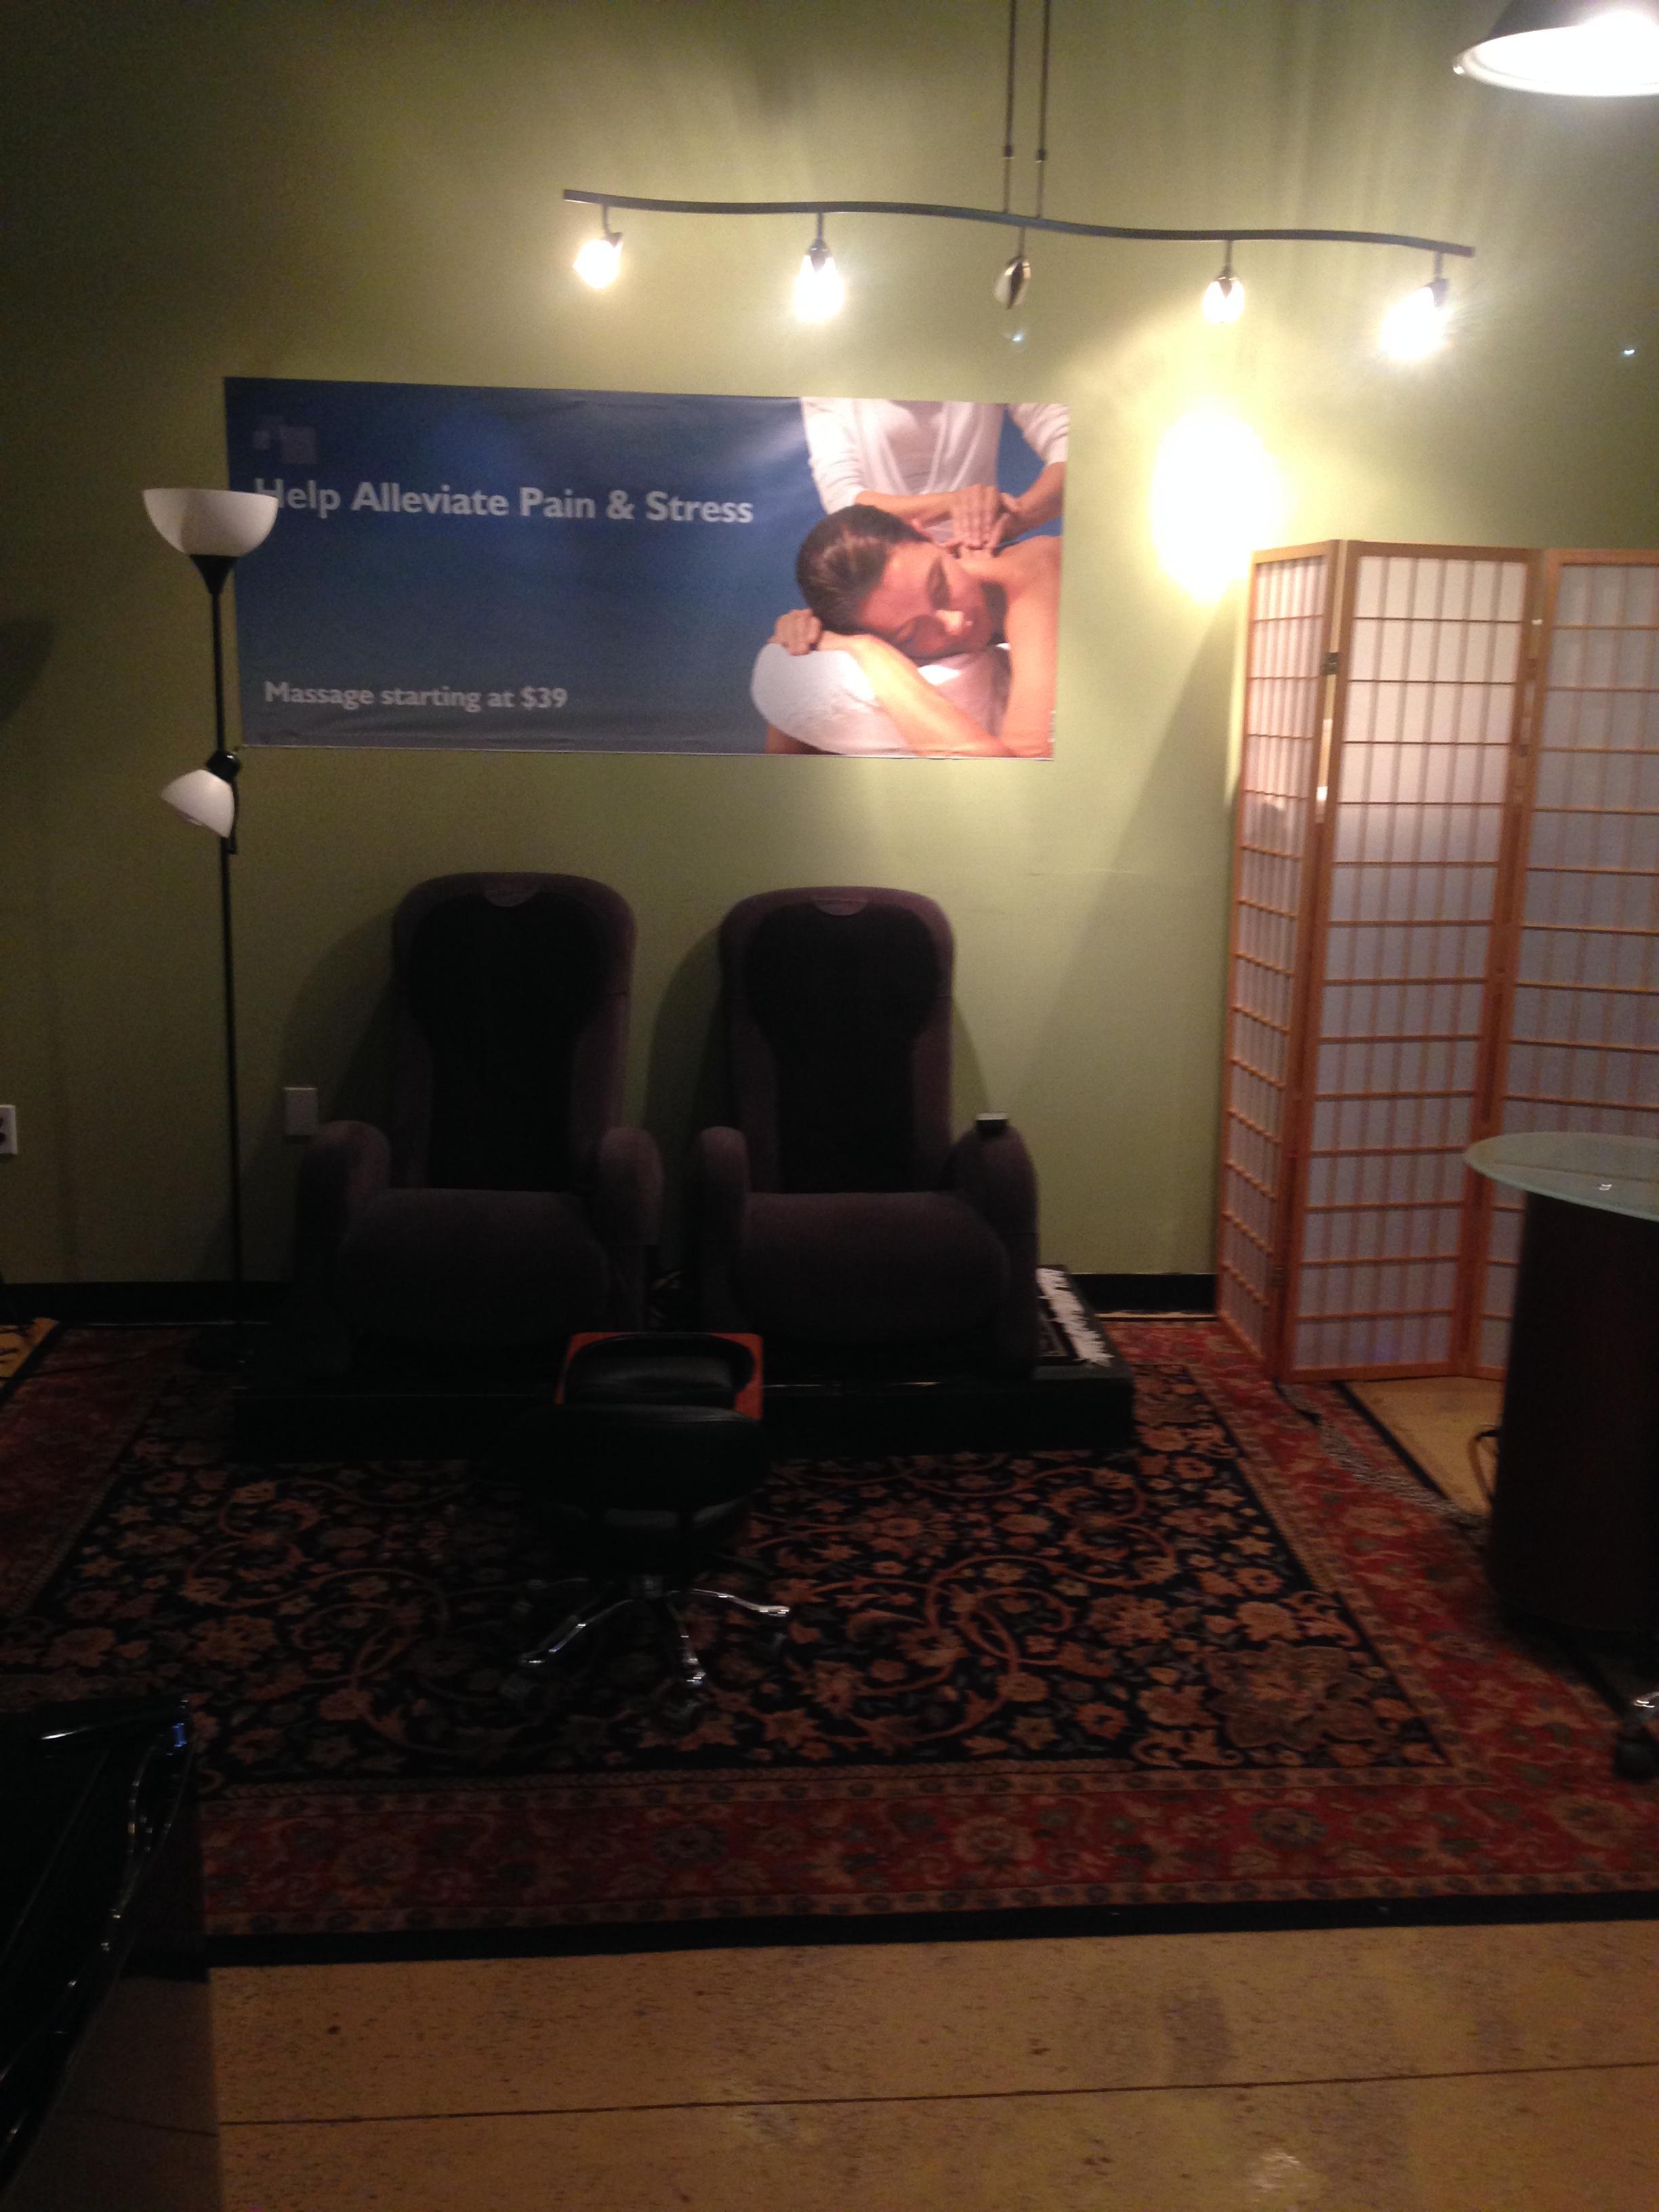 Studio Fit Day Spa